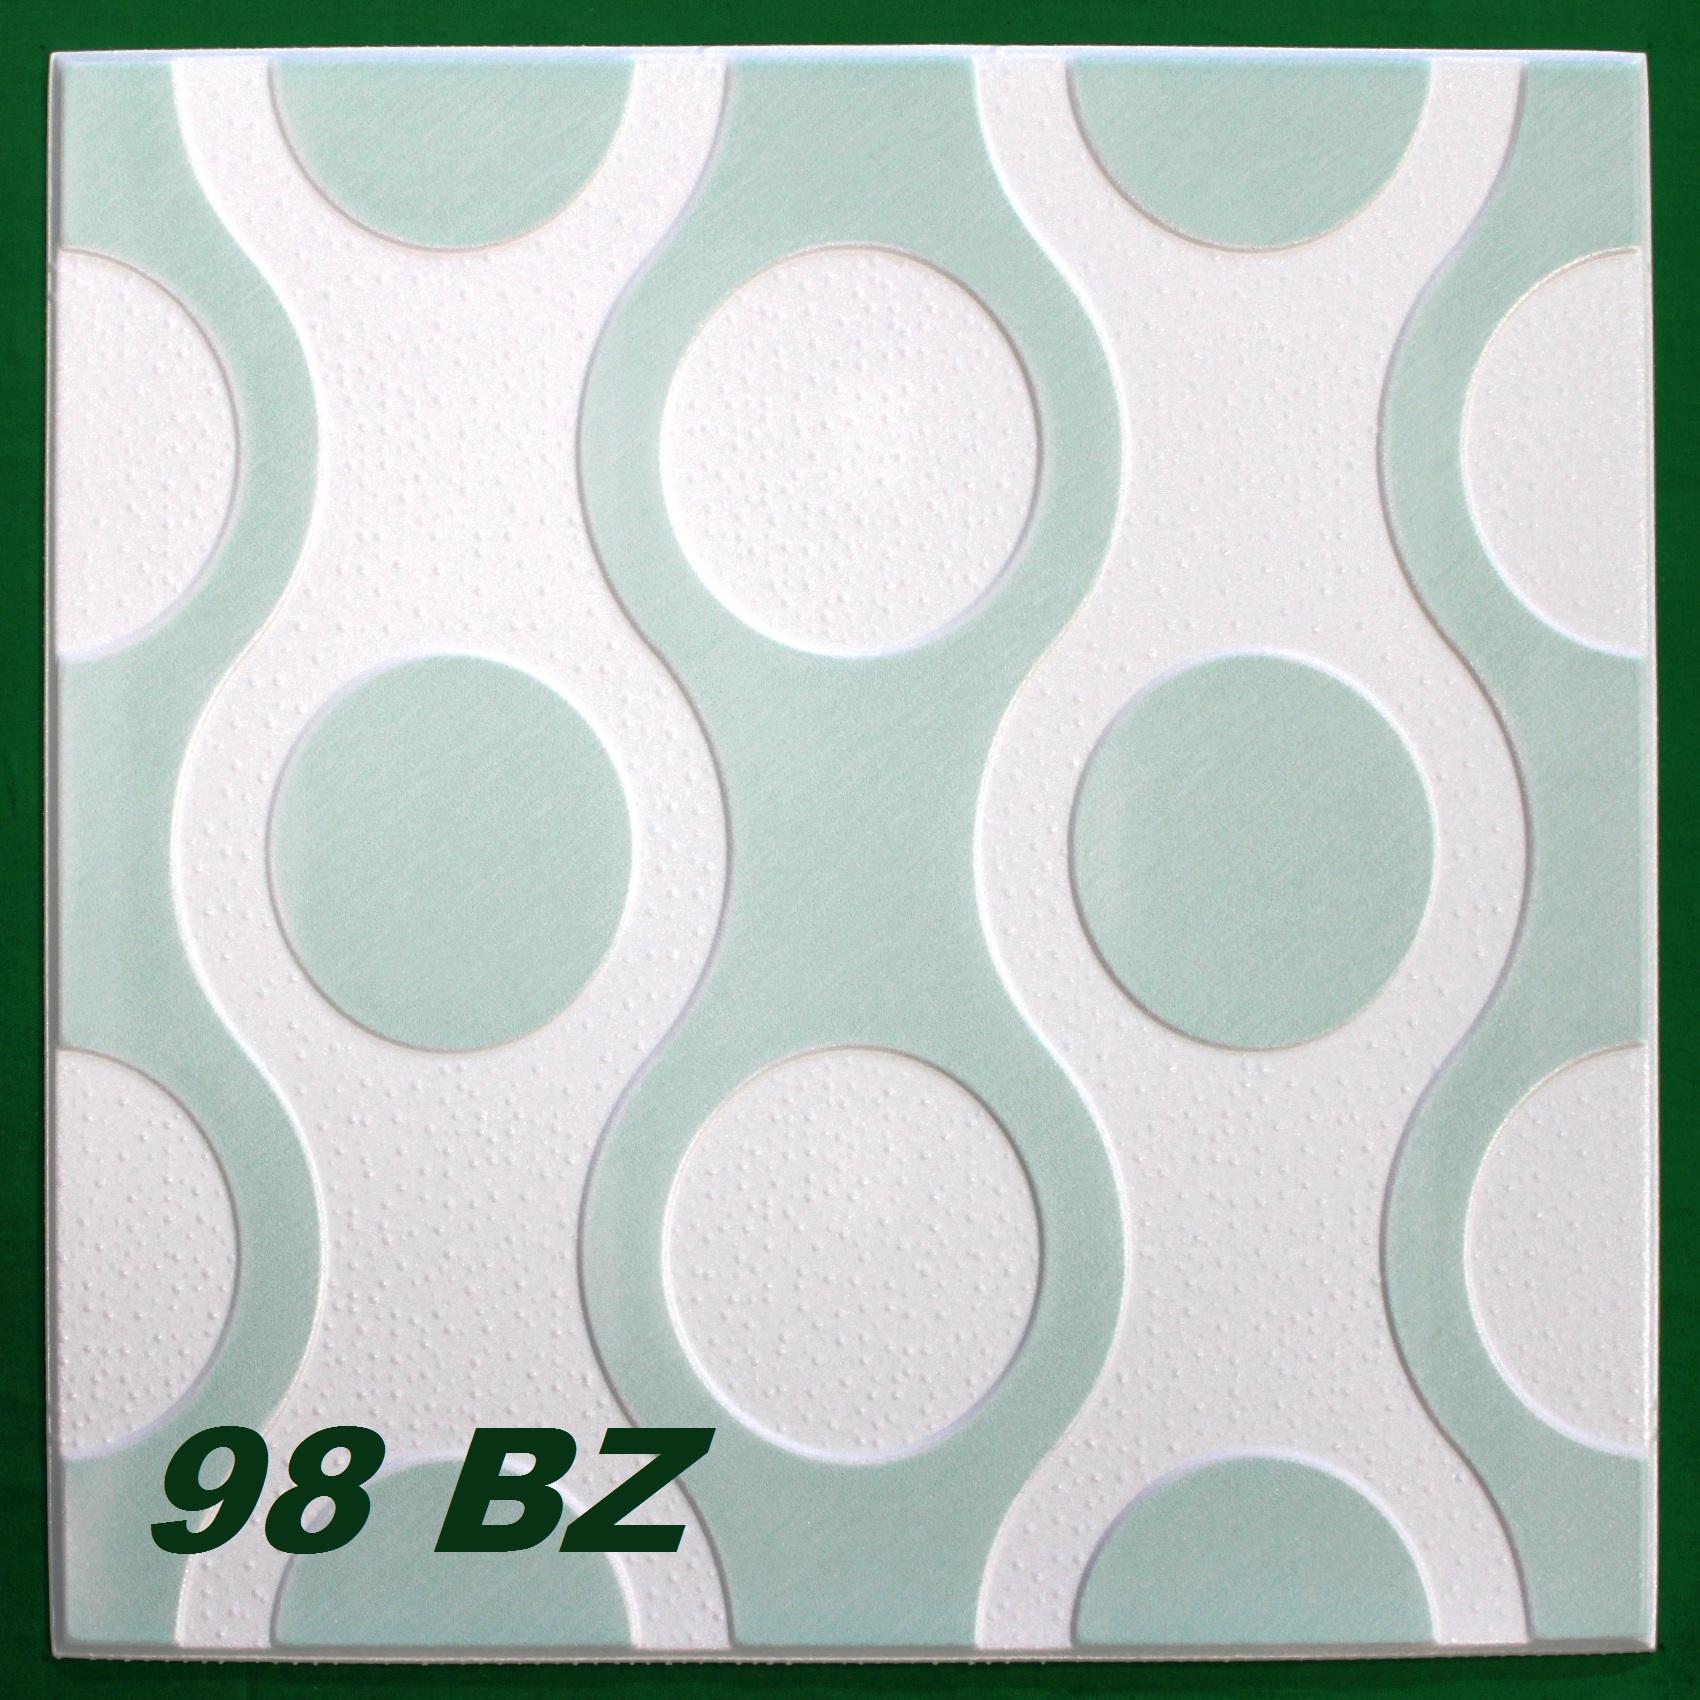 1 m2 deckenplatten styroporplatten stuck farbige platten 50x50cm l hne. Black Bedroom Furniture Sets. Home Design Ideas